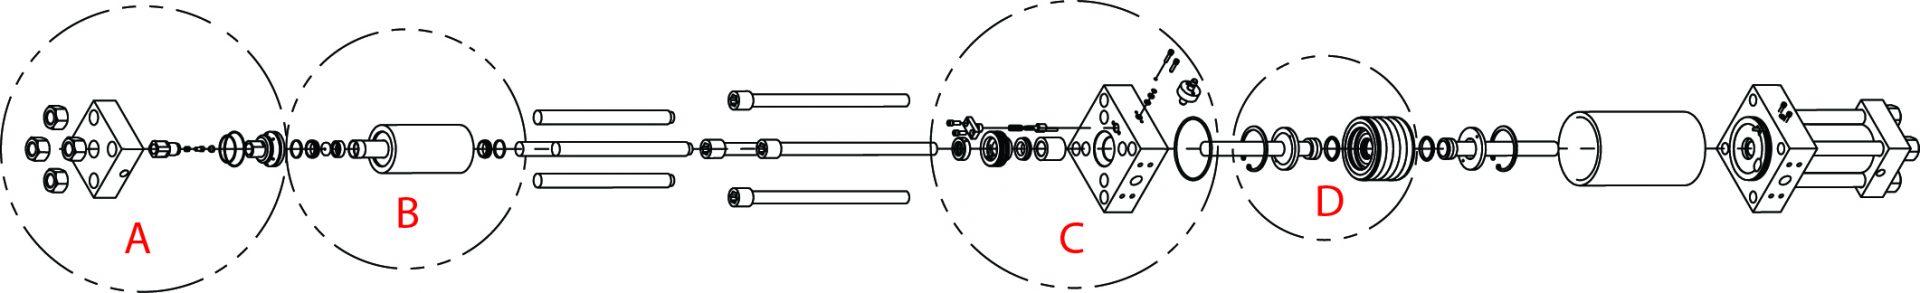 composant pompe accustream - Component High Pressure Pump